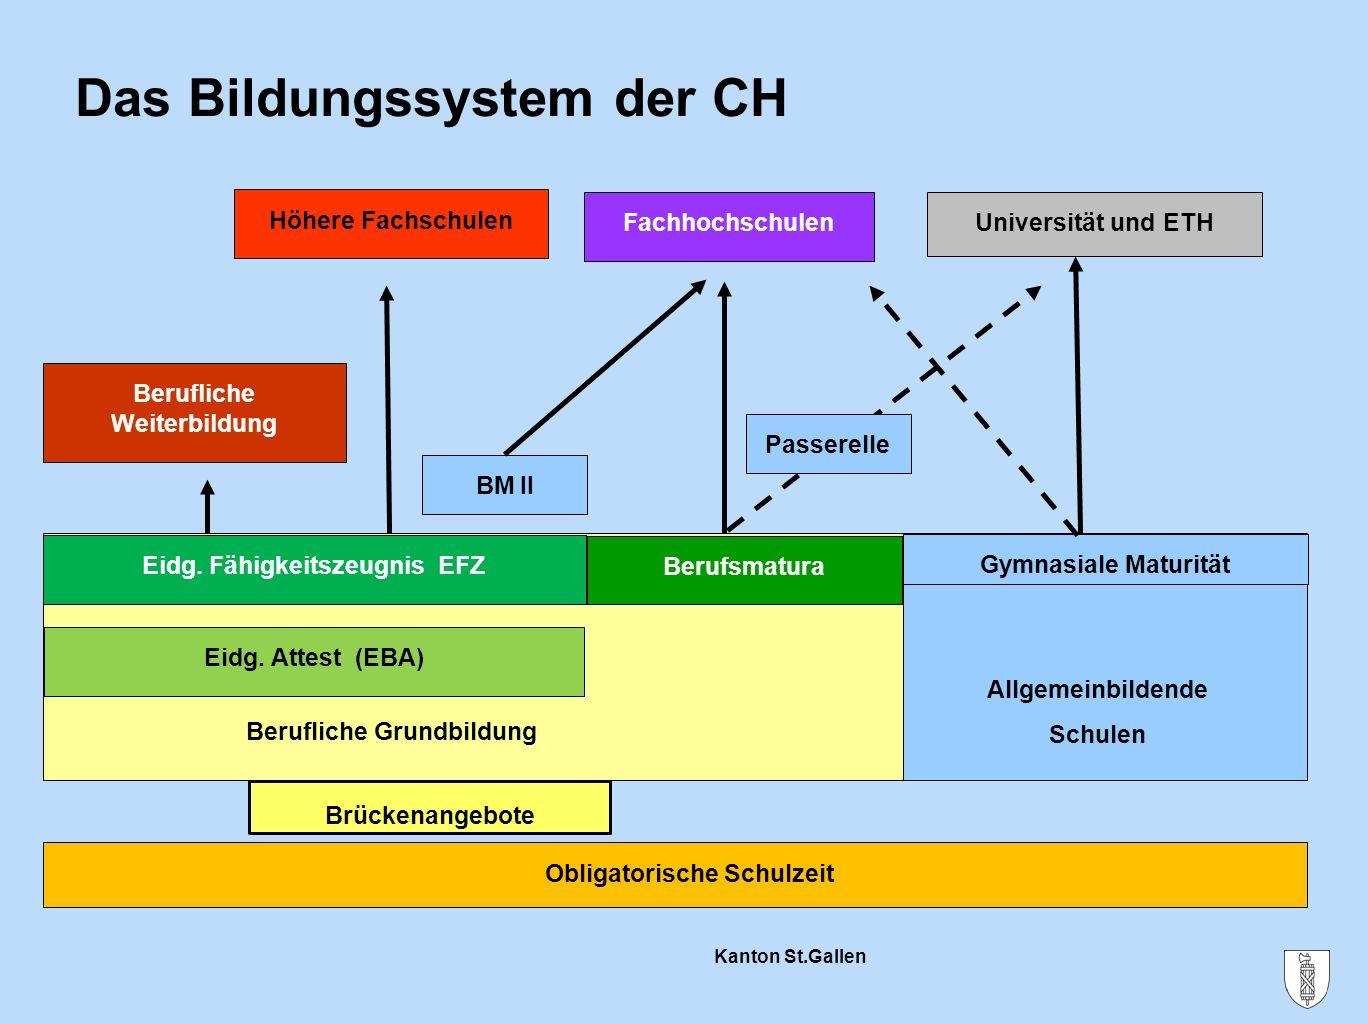 Kanton St.Gallen - F + IKA Kaufmännische Grundbildung Berufsmatura II B-ProfilE-Profil M-Profil Berufsmatura Aufnahme- prüfung RealschuleSekundarschule  F + IKA + WG